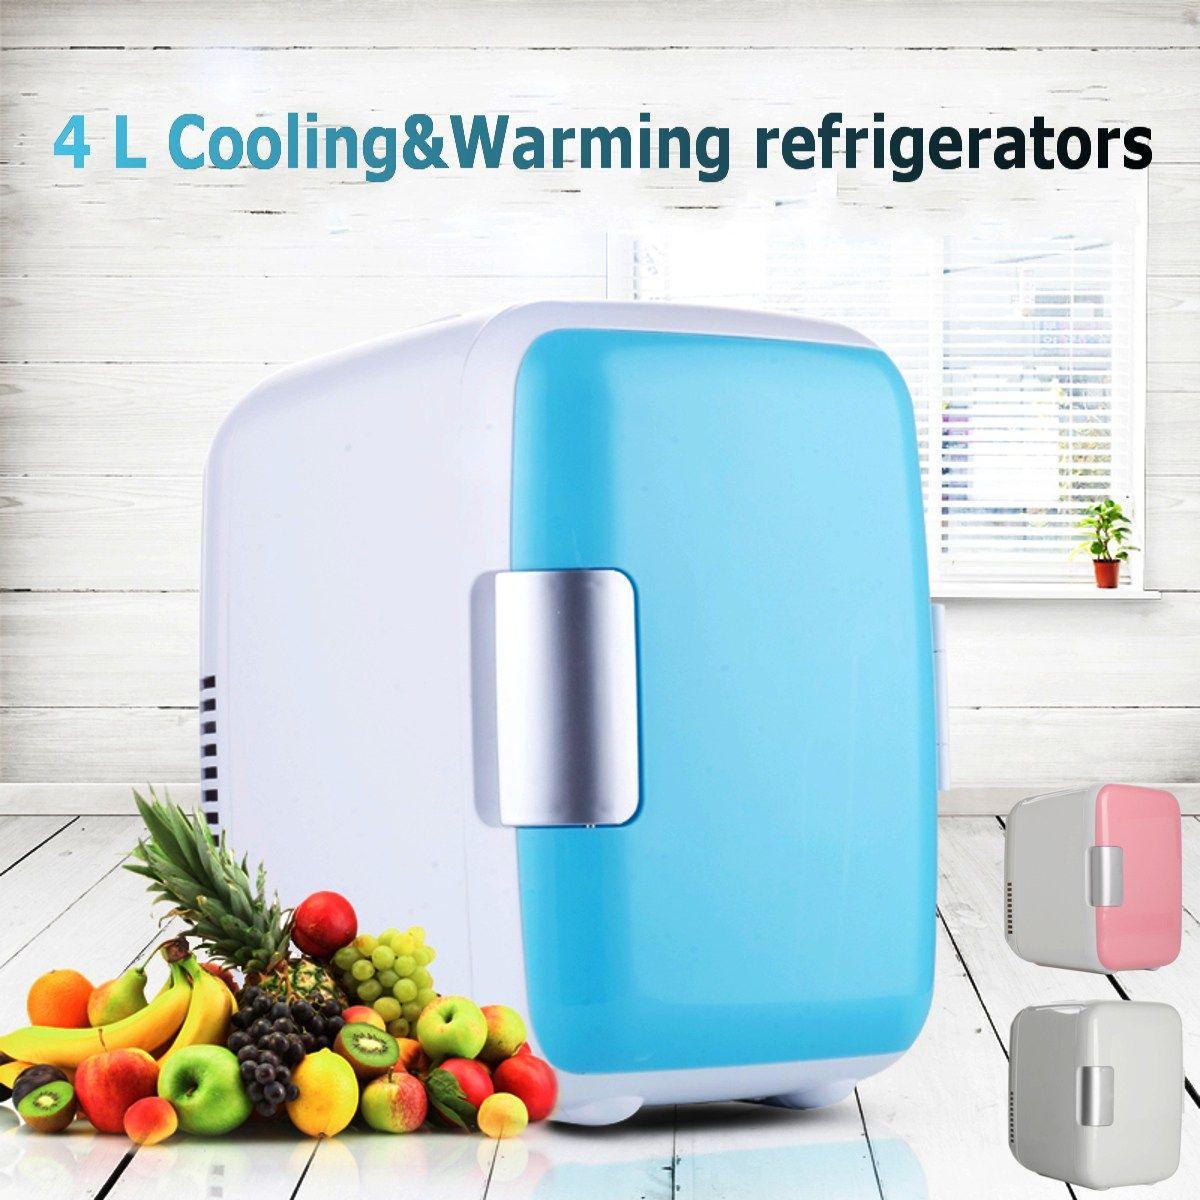 KROAK Portable Mini Car Refrigerator Fridge 4L Cooler Warmer Car Freezer Boat Home Office 12V